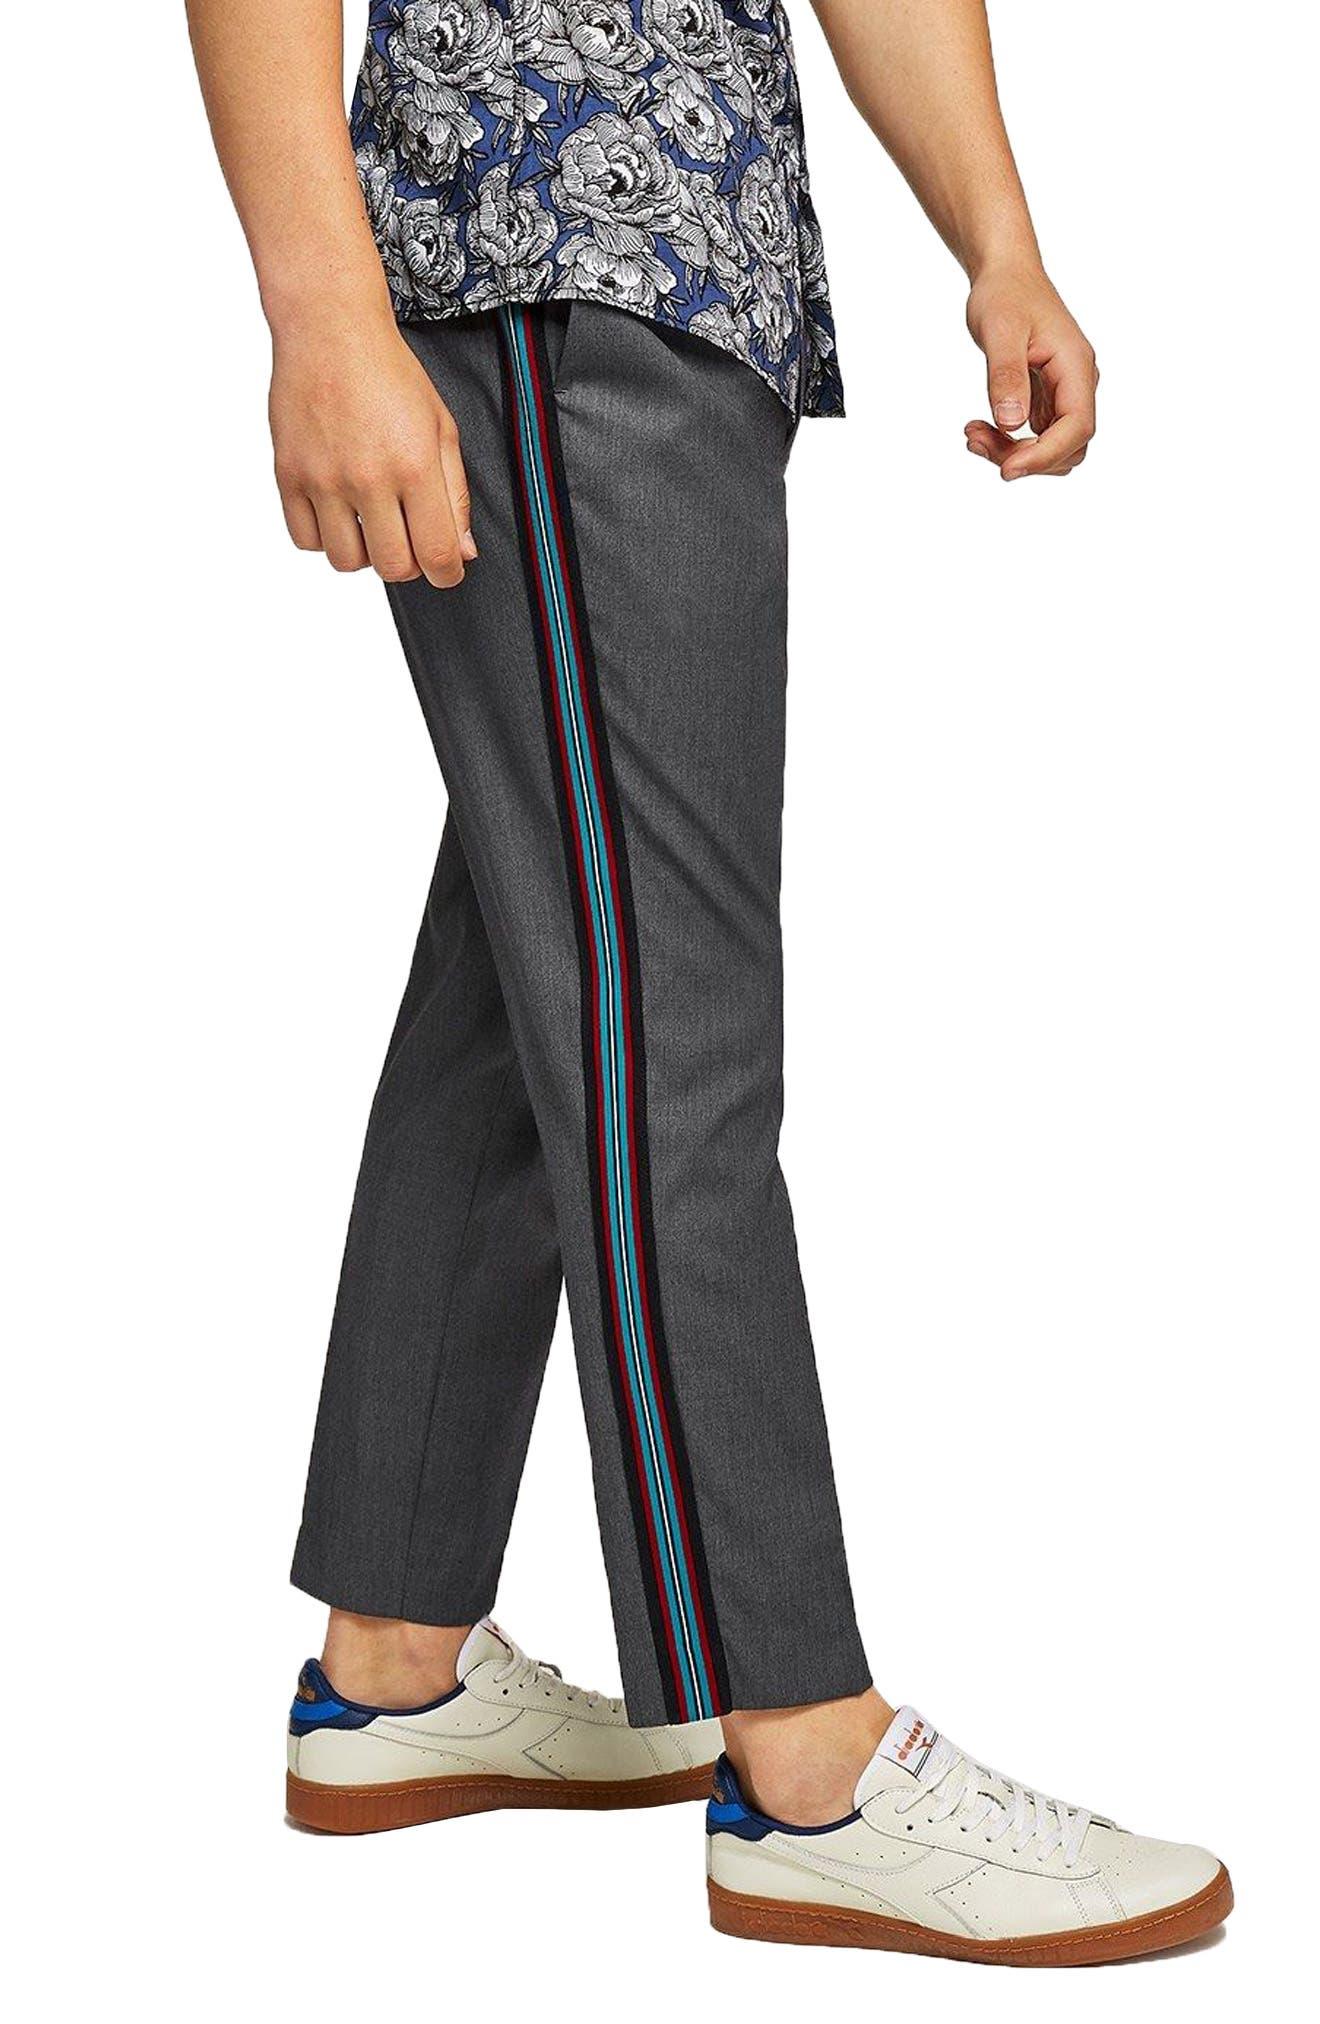 Mélange Slim Jogger Pants,                             Main thumbnail 1, color,                             020